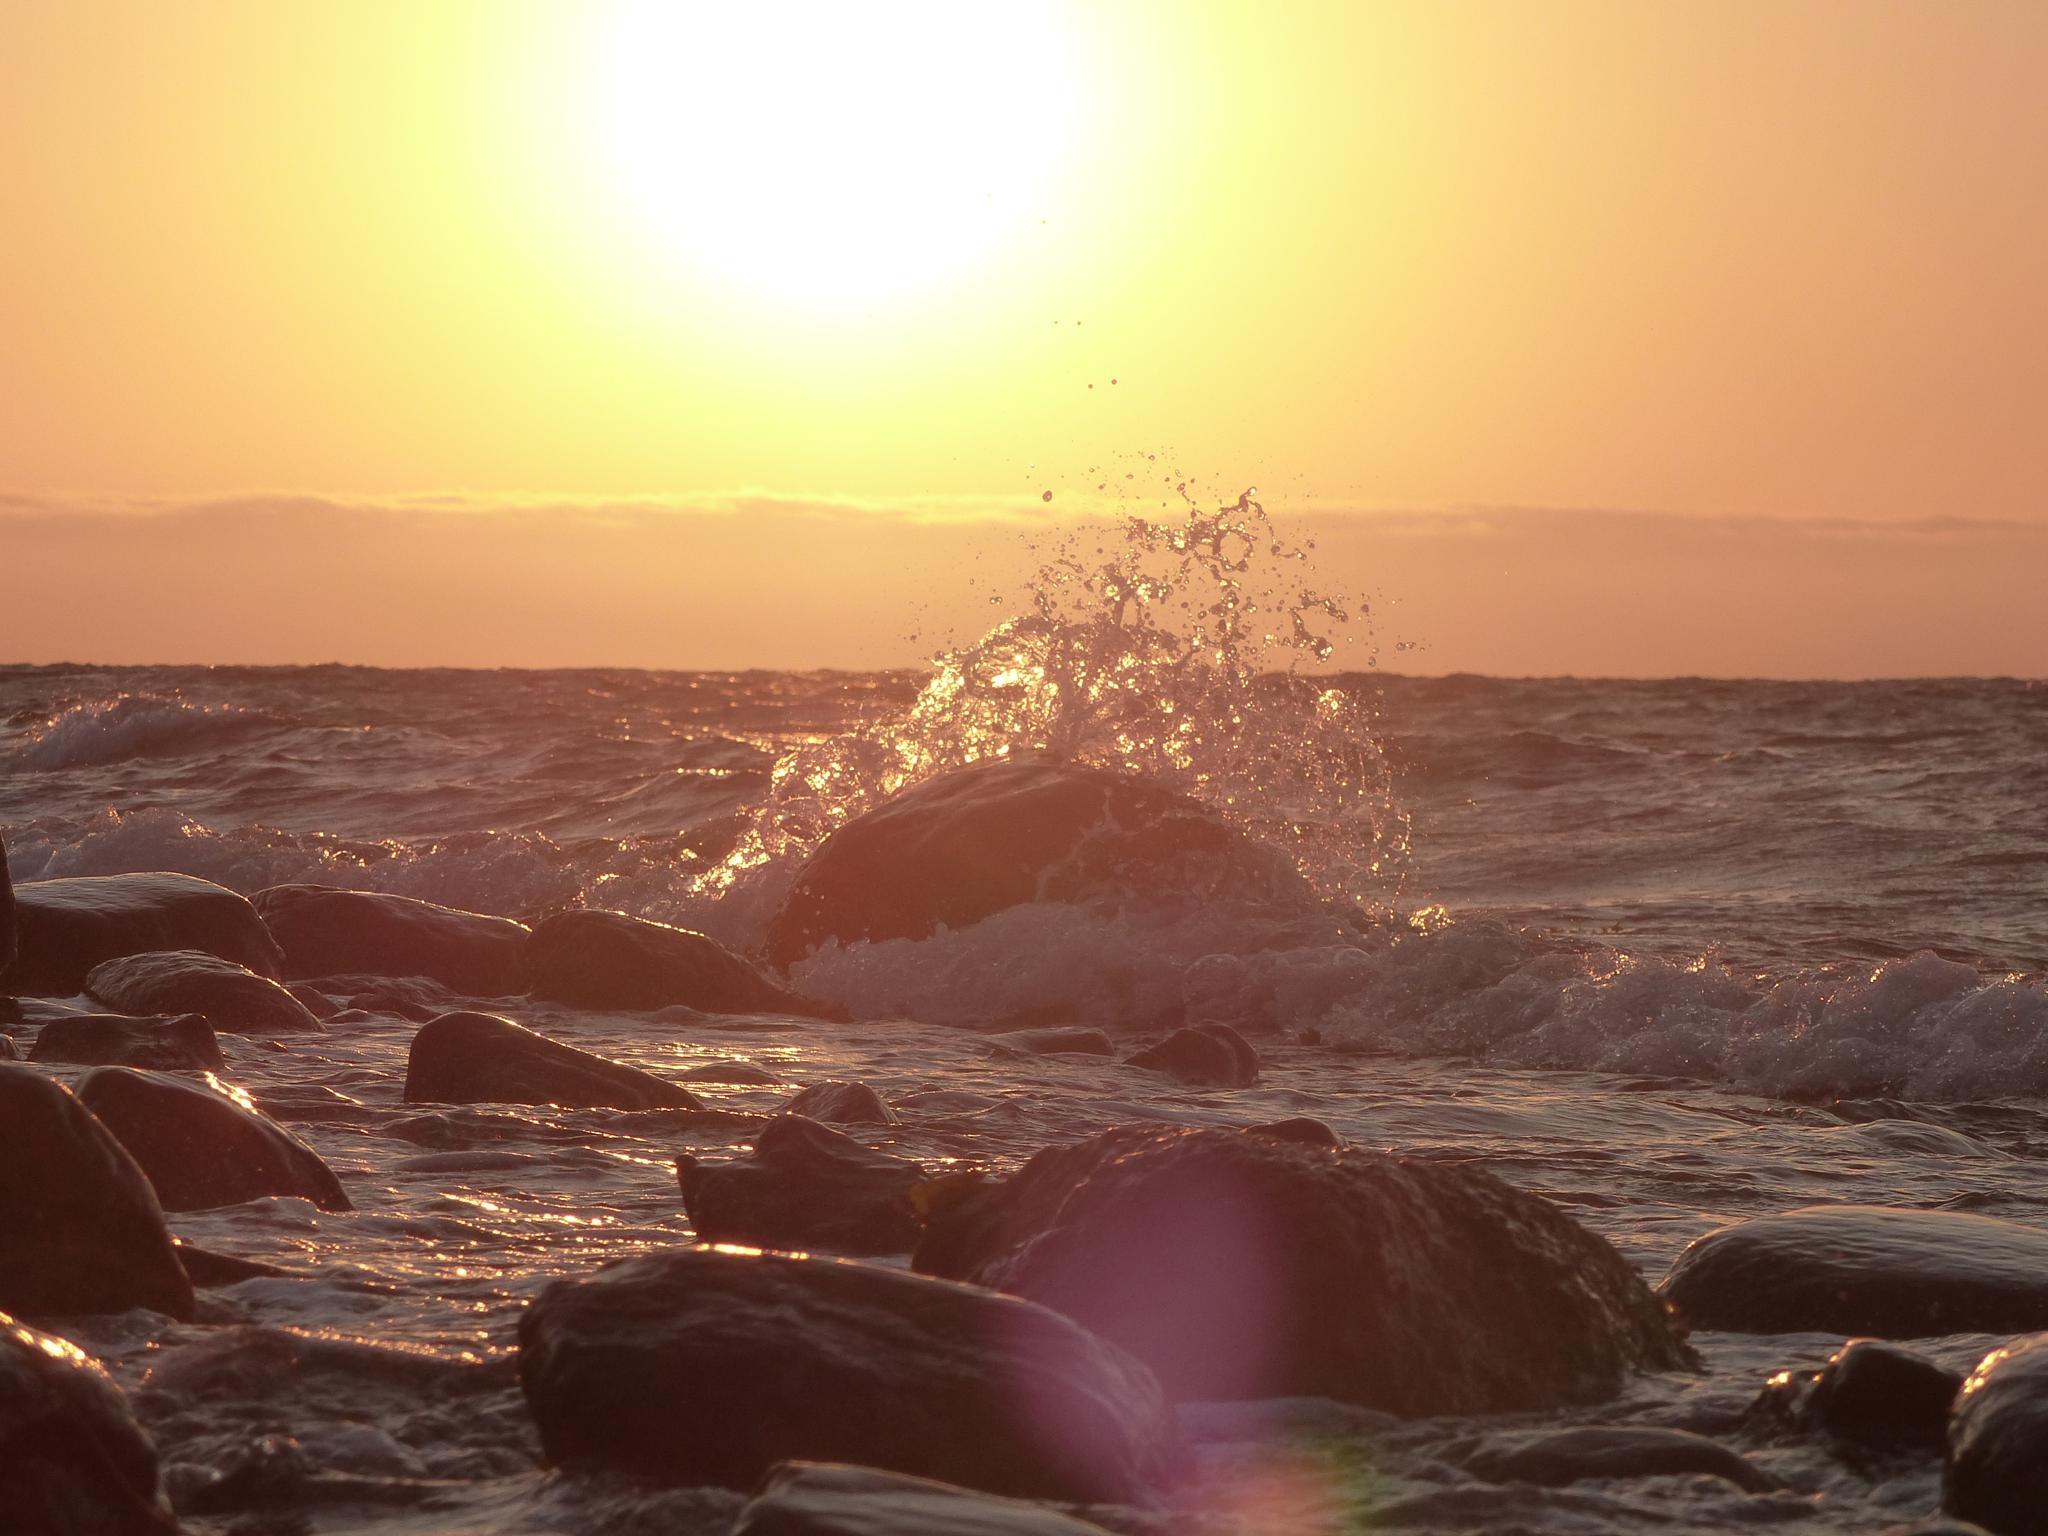 Sunrise on the beach by Lars M.